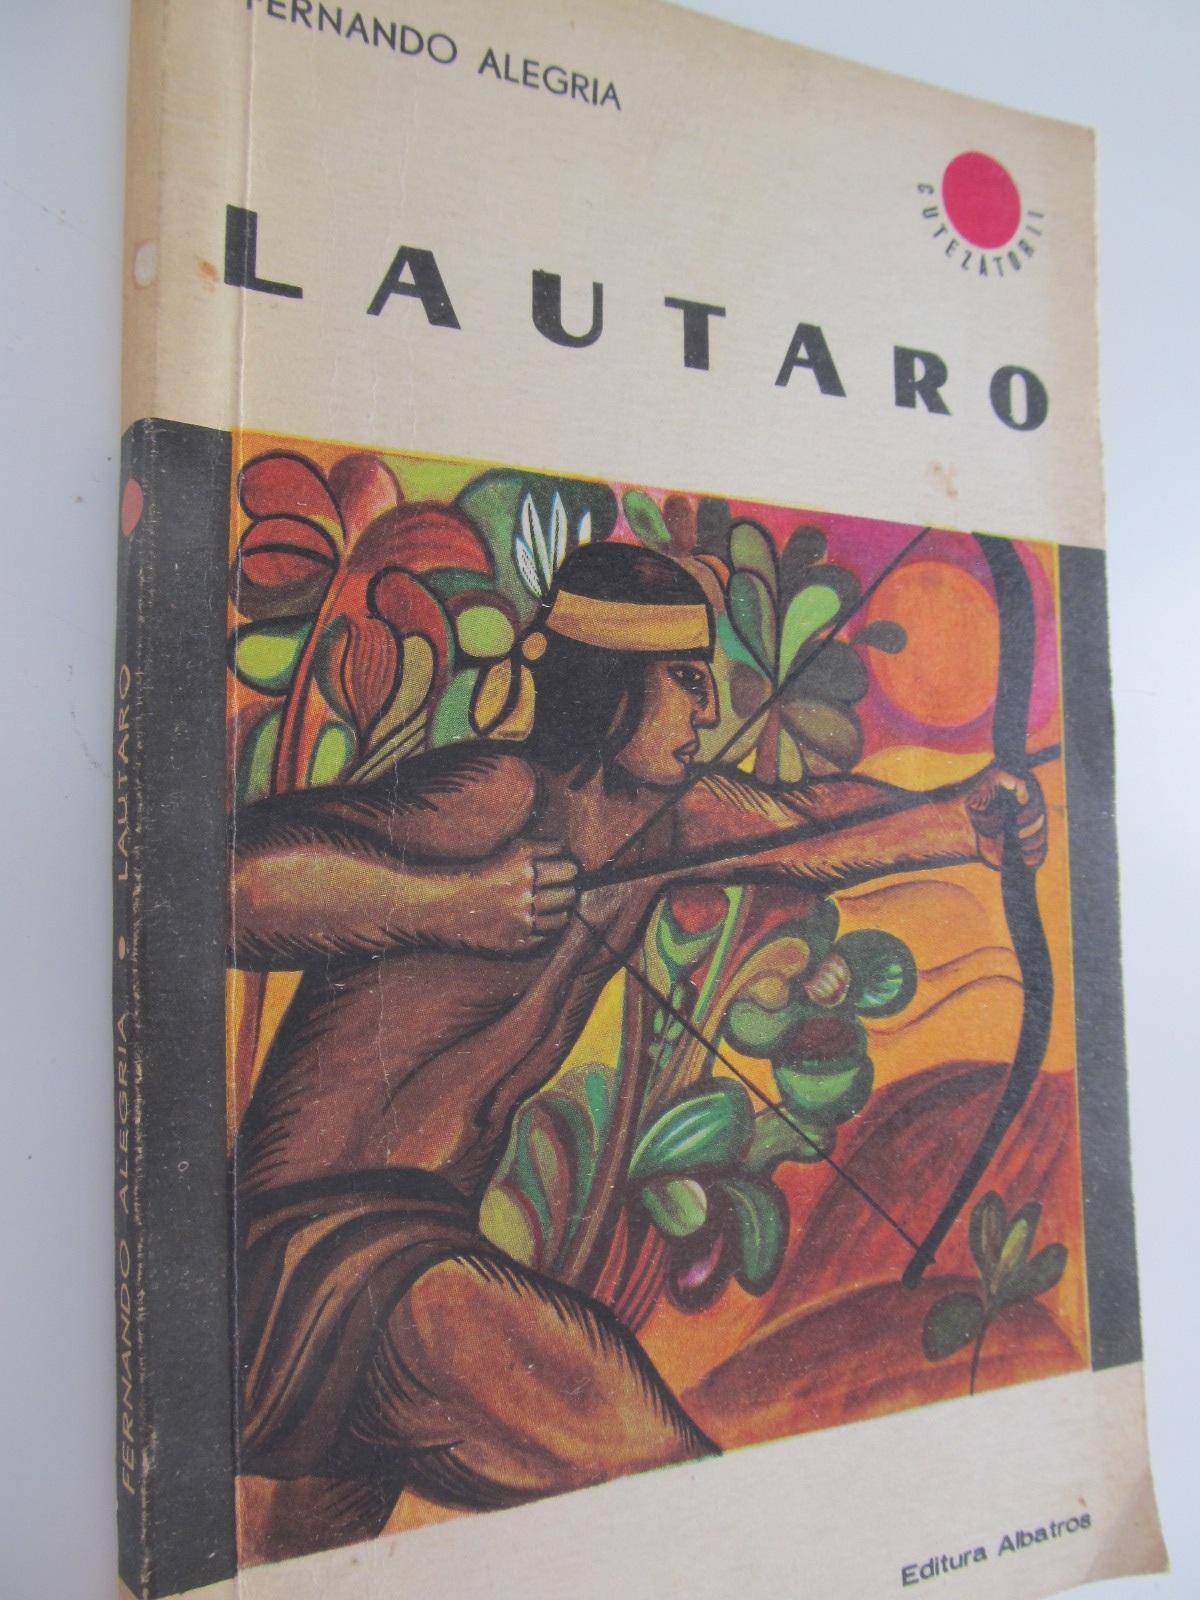 Lautaro - Fernando Alegria | Detalii carte